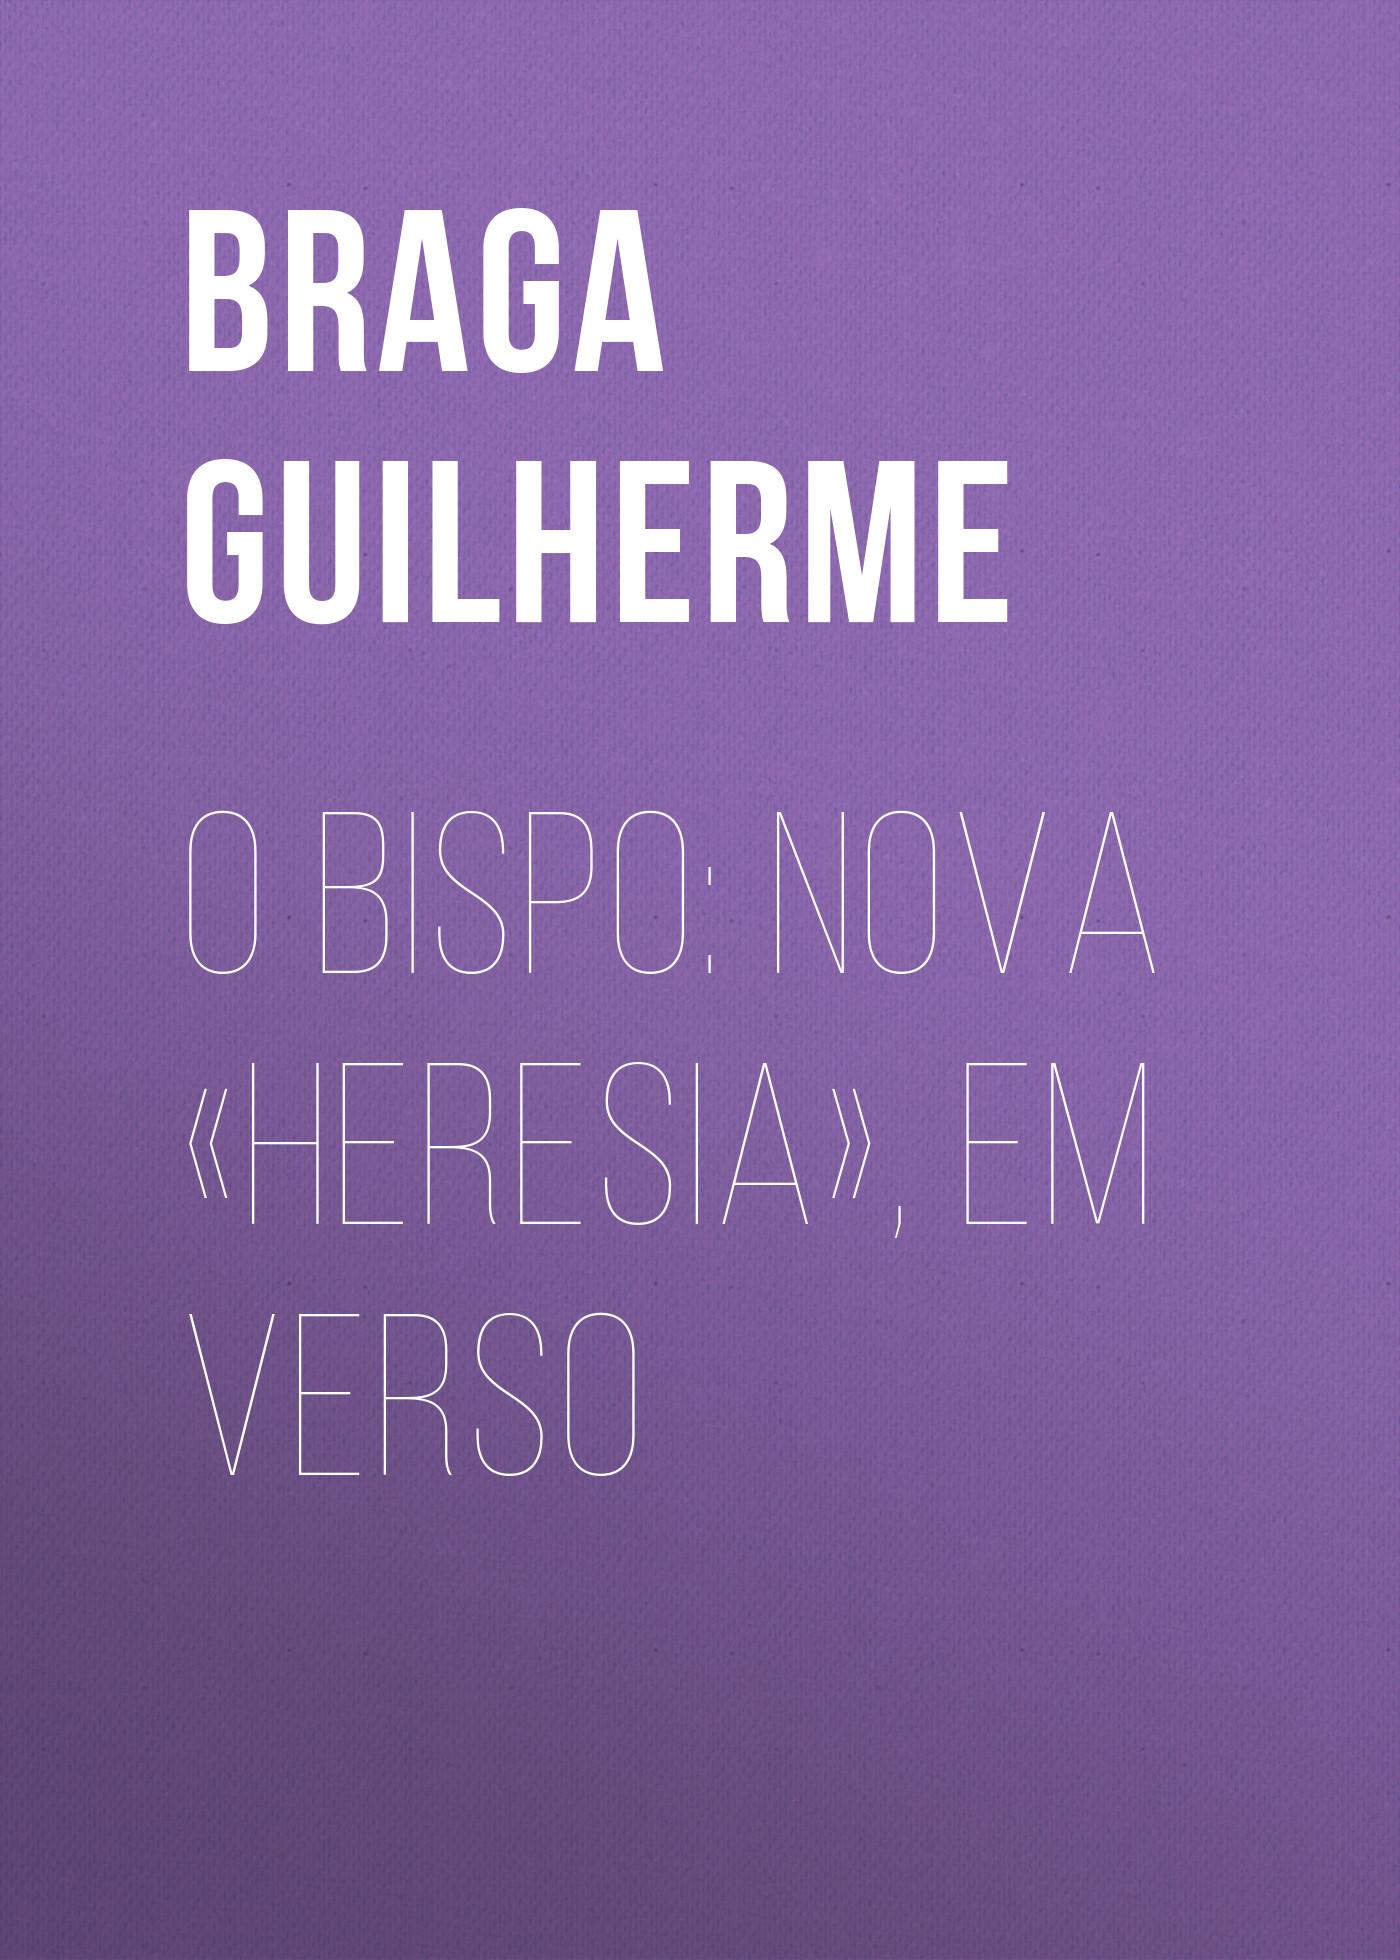 Braga Guilherme O Bispo: Nova «Heresia», em verso braga guilherme o bispo nova heresia em verso